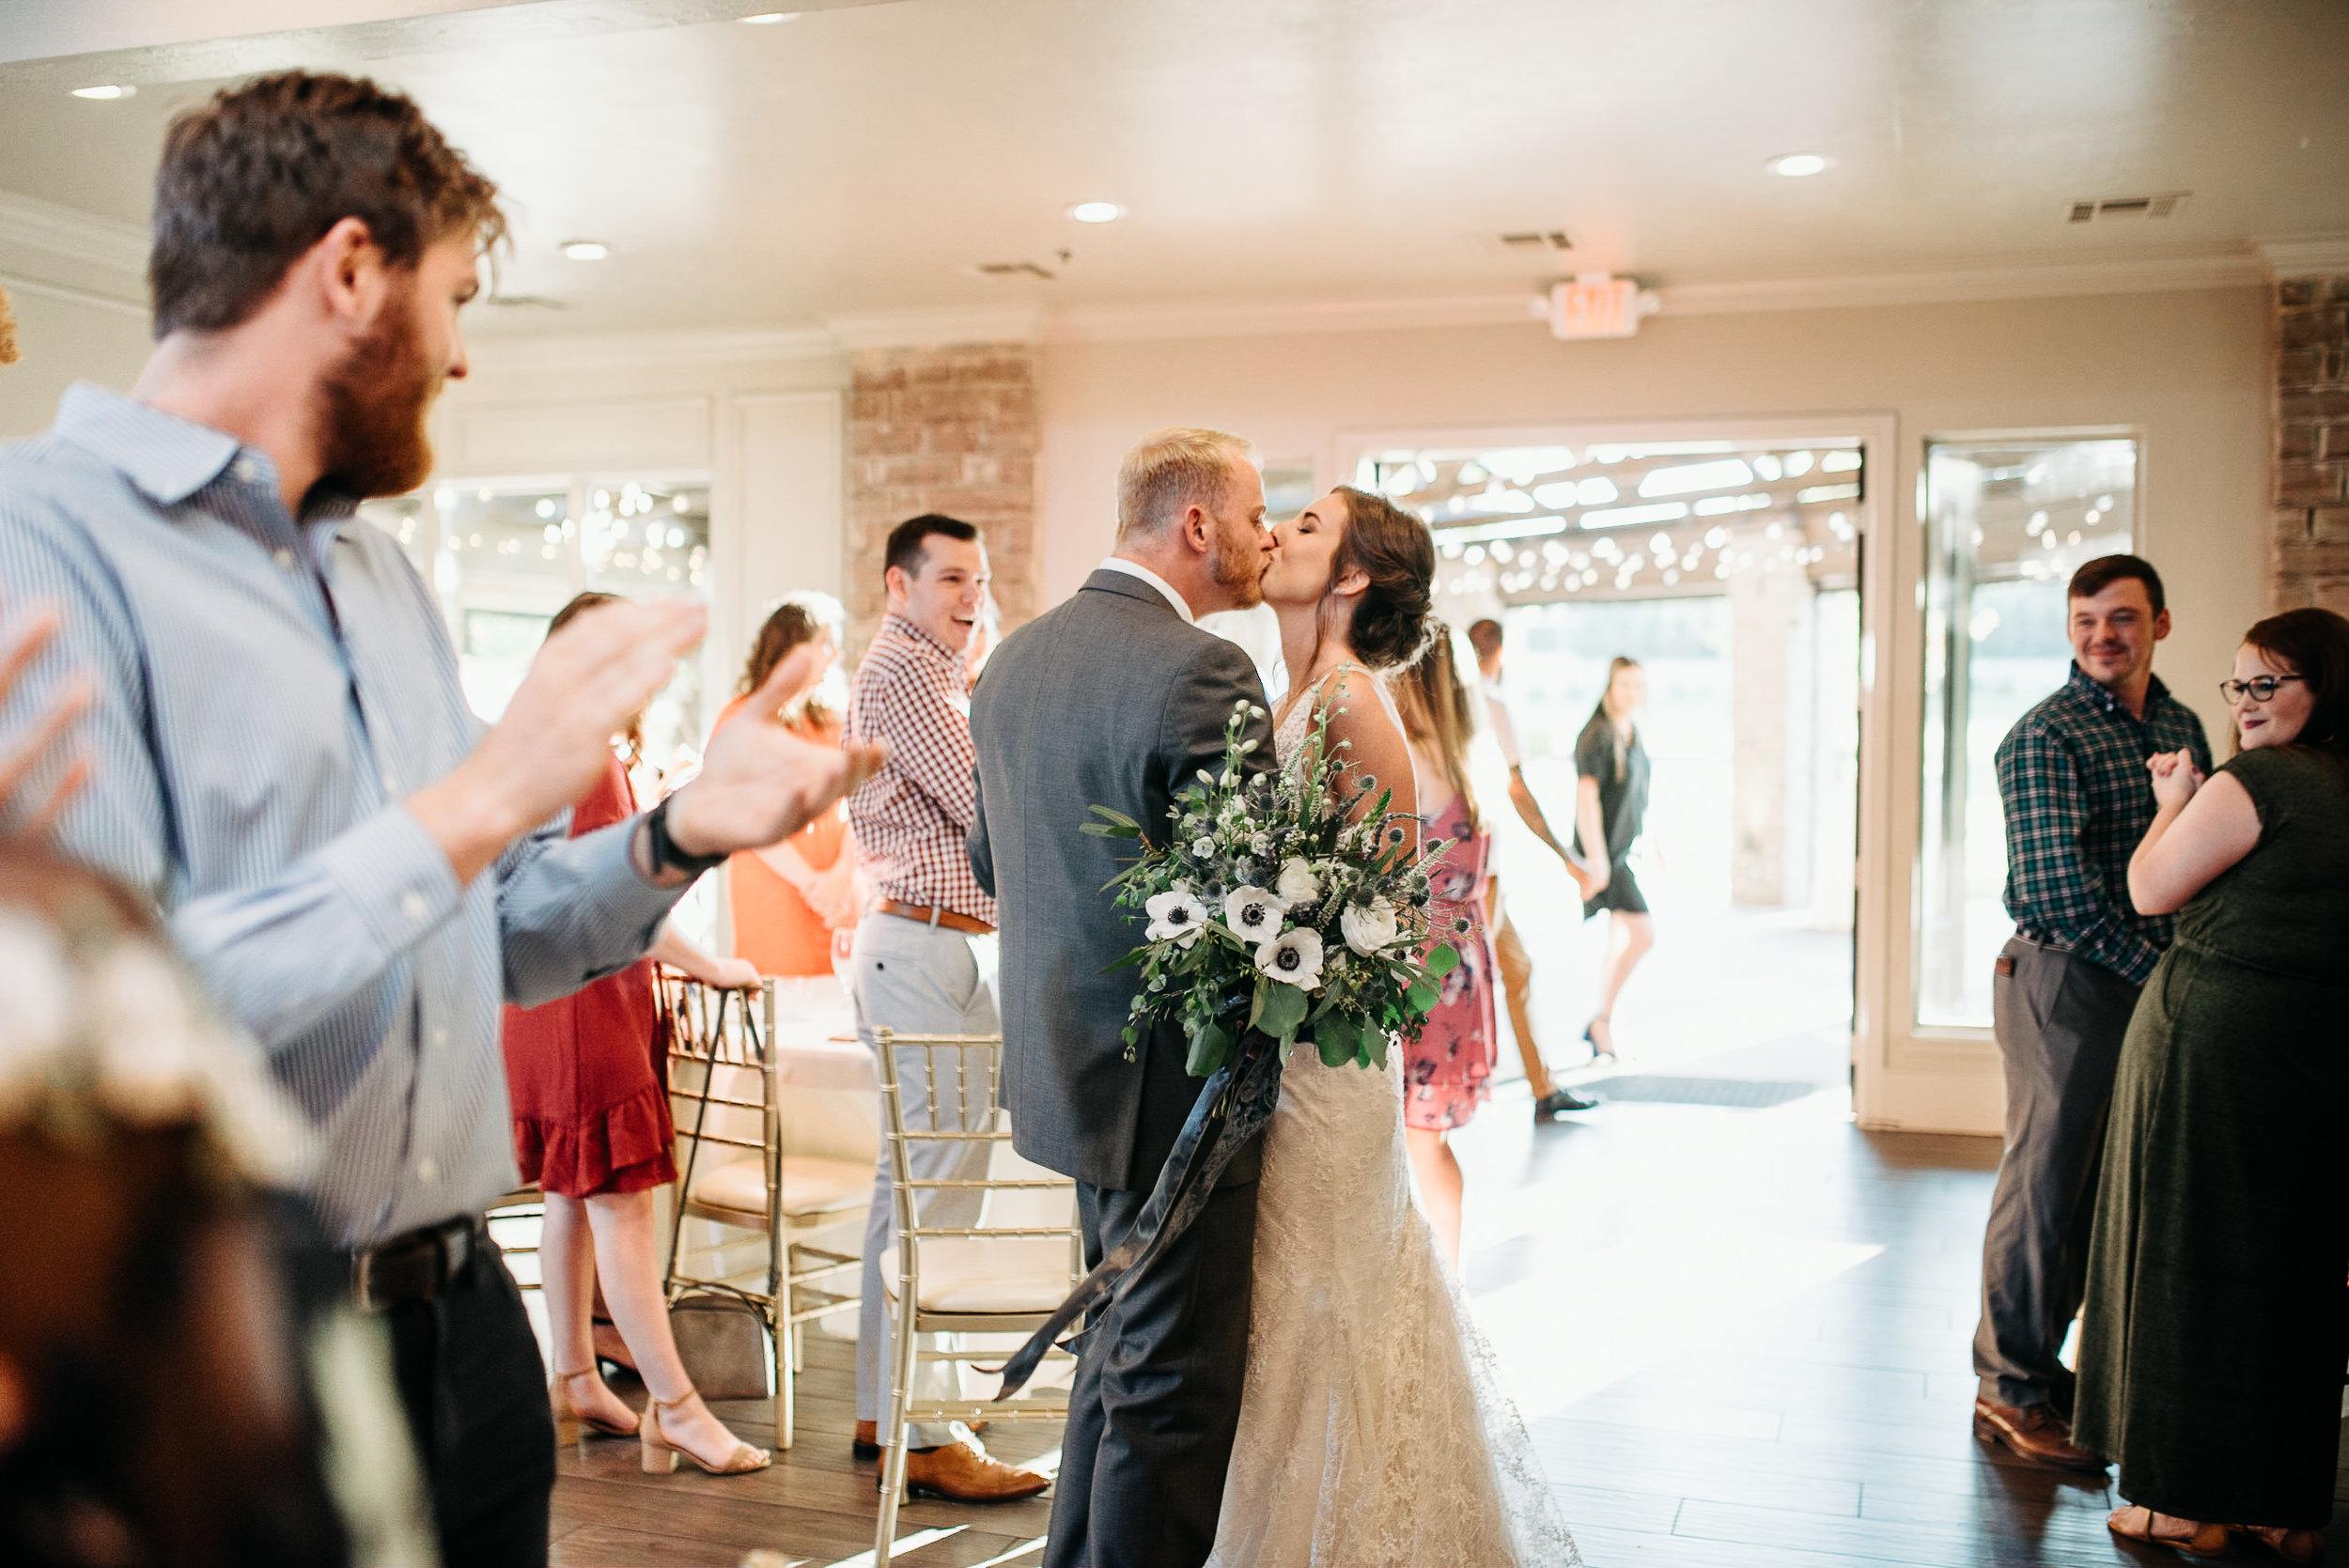 okc-wedding-photographer-coles-garden-wedding-okc-best-wedding-photographers-137.jpg